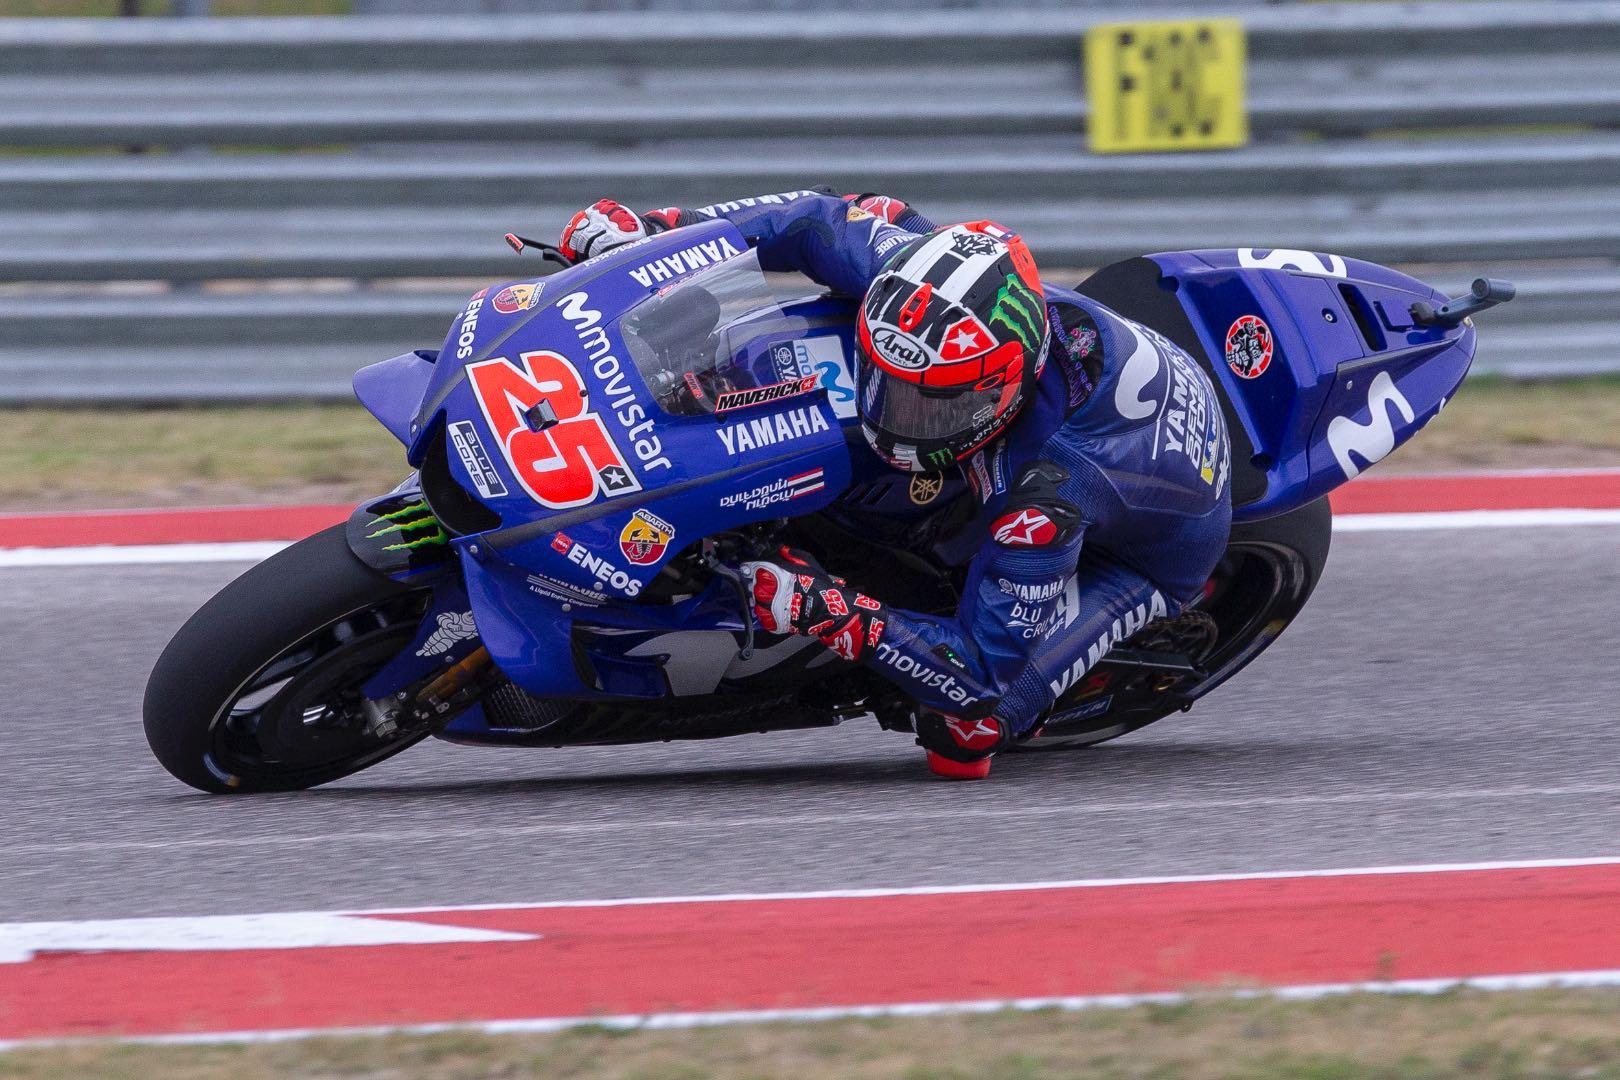 2018 Austin MotoGP Qualifying: Yamaha's Maverick Vinales